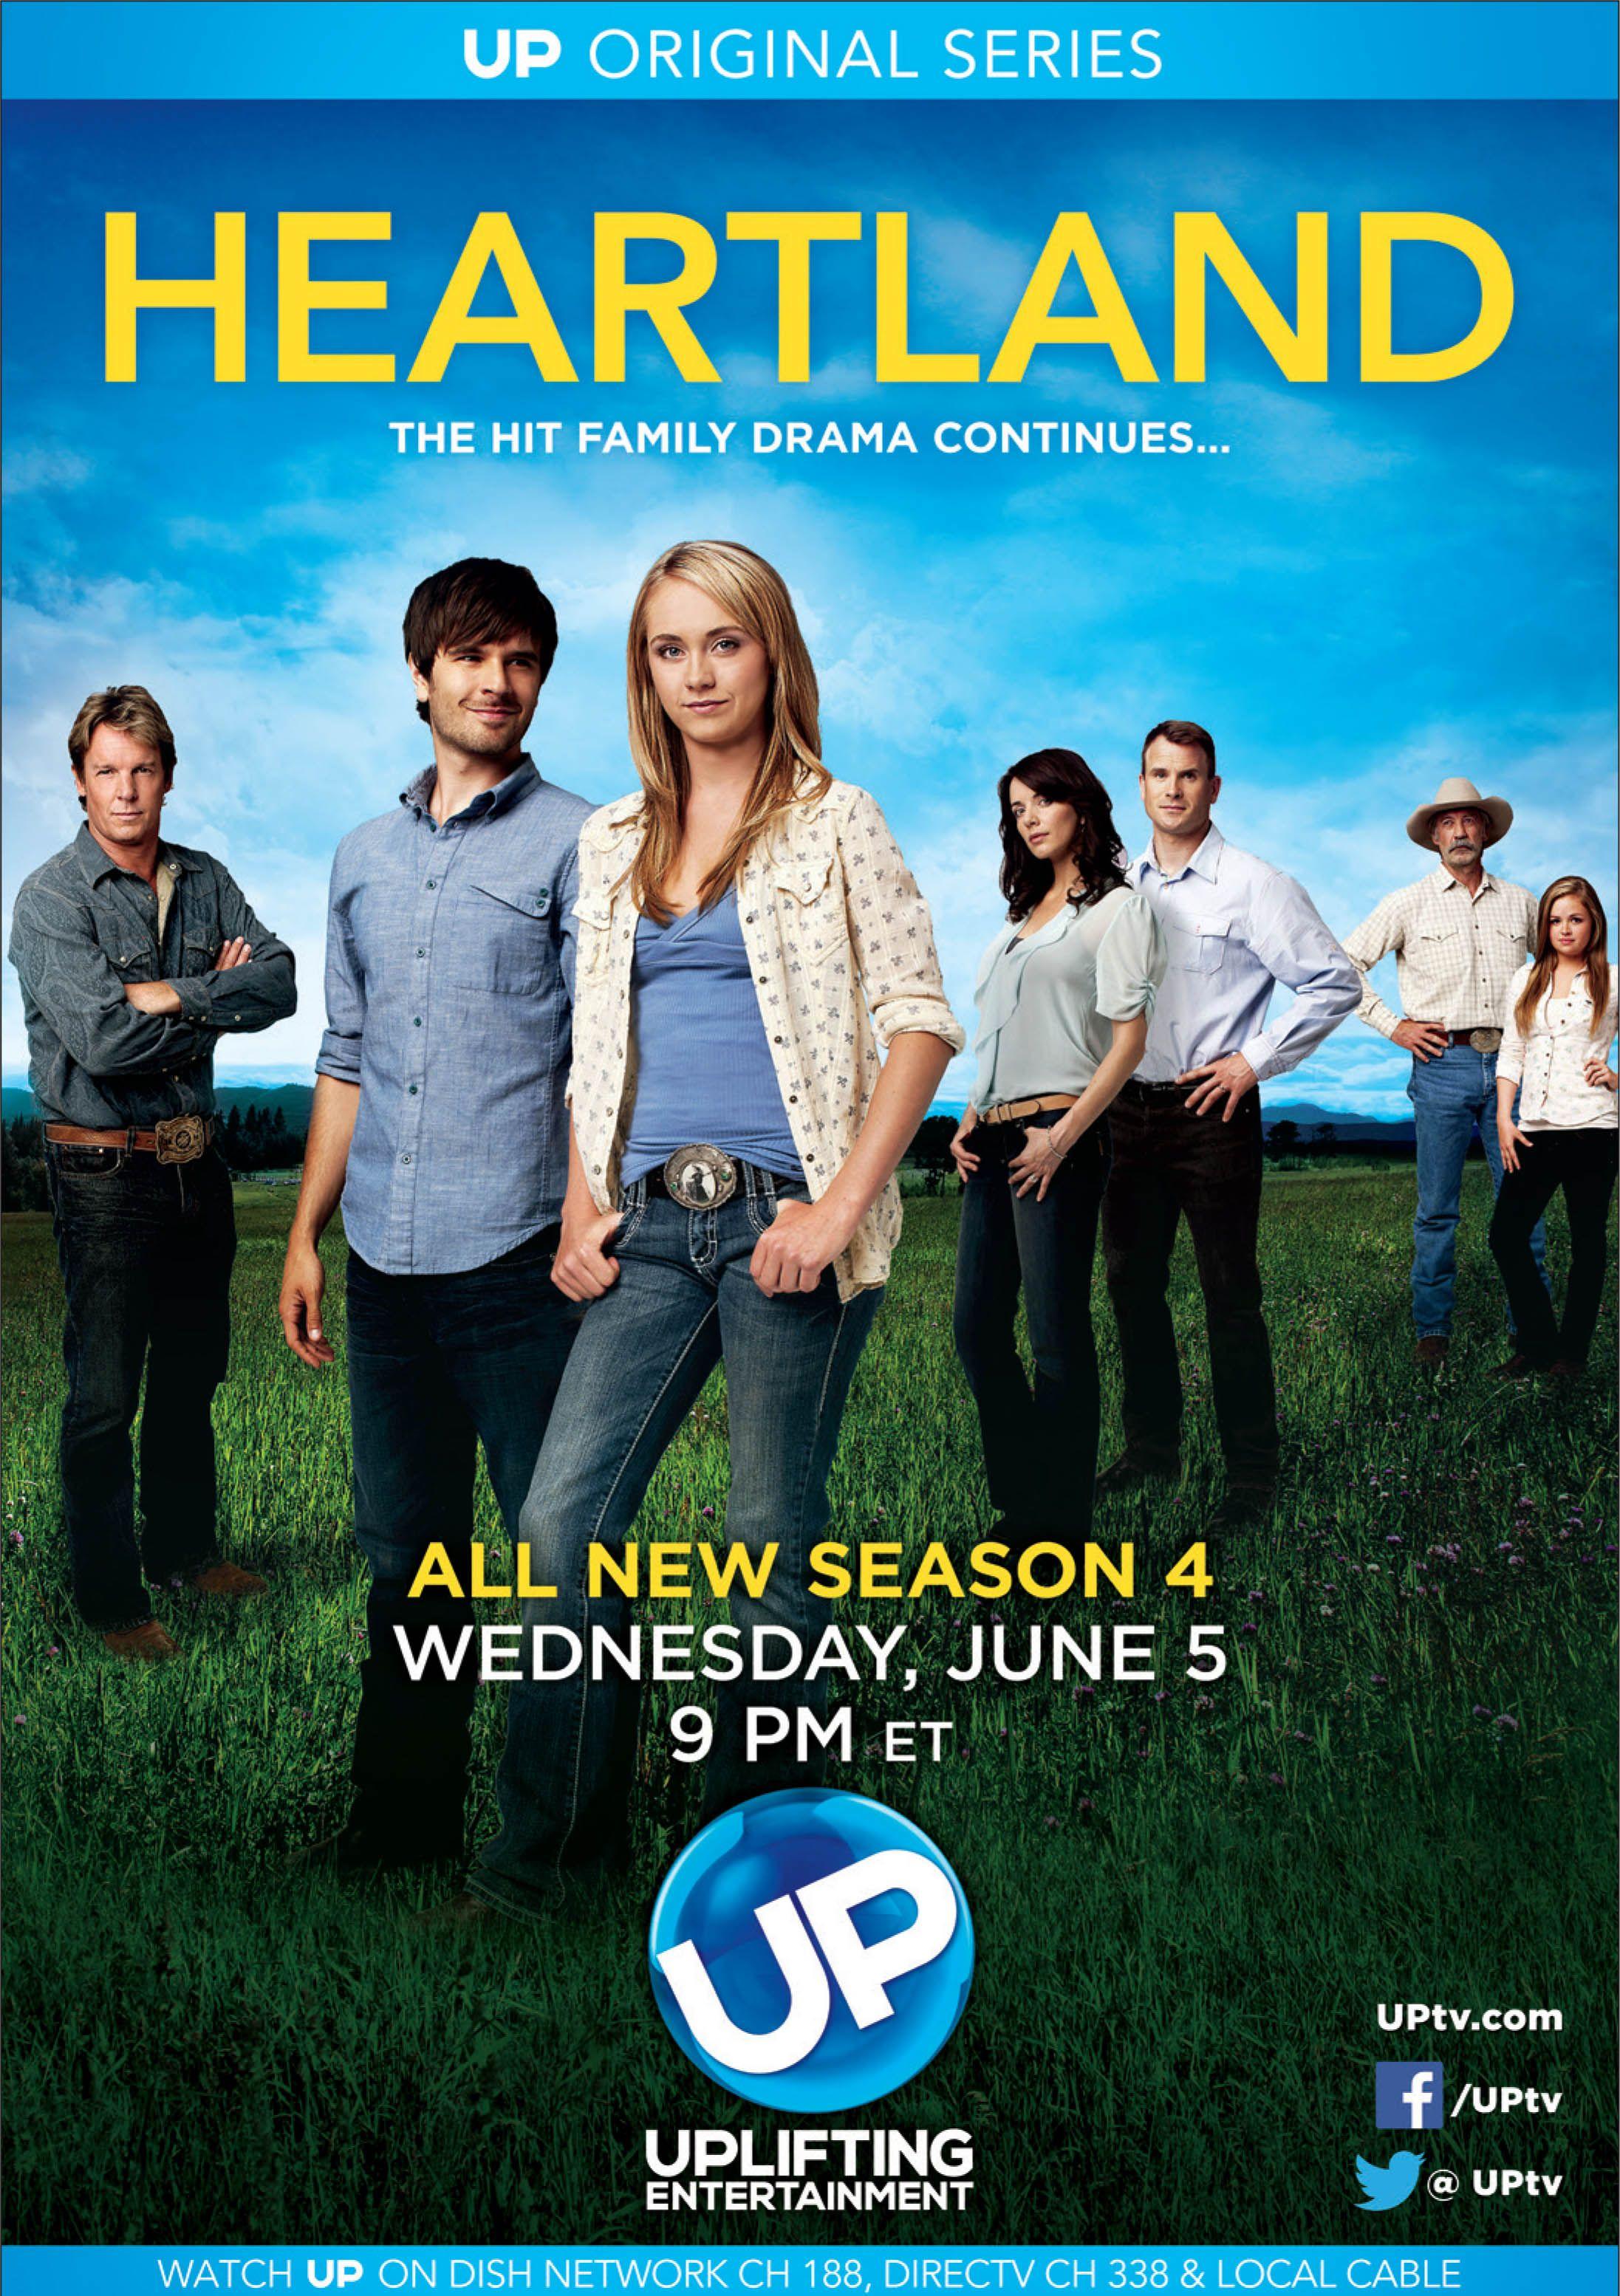 Watch New Episodes Of Heartland Season 4 Wednesdays At 9pm Et On Up Www Uptv Com Heartland Heartland Tv Show Heartland Heartland Cast